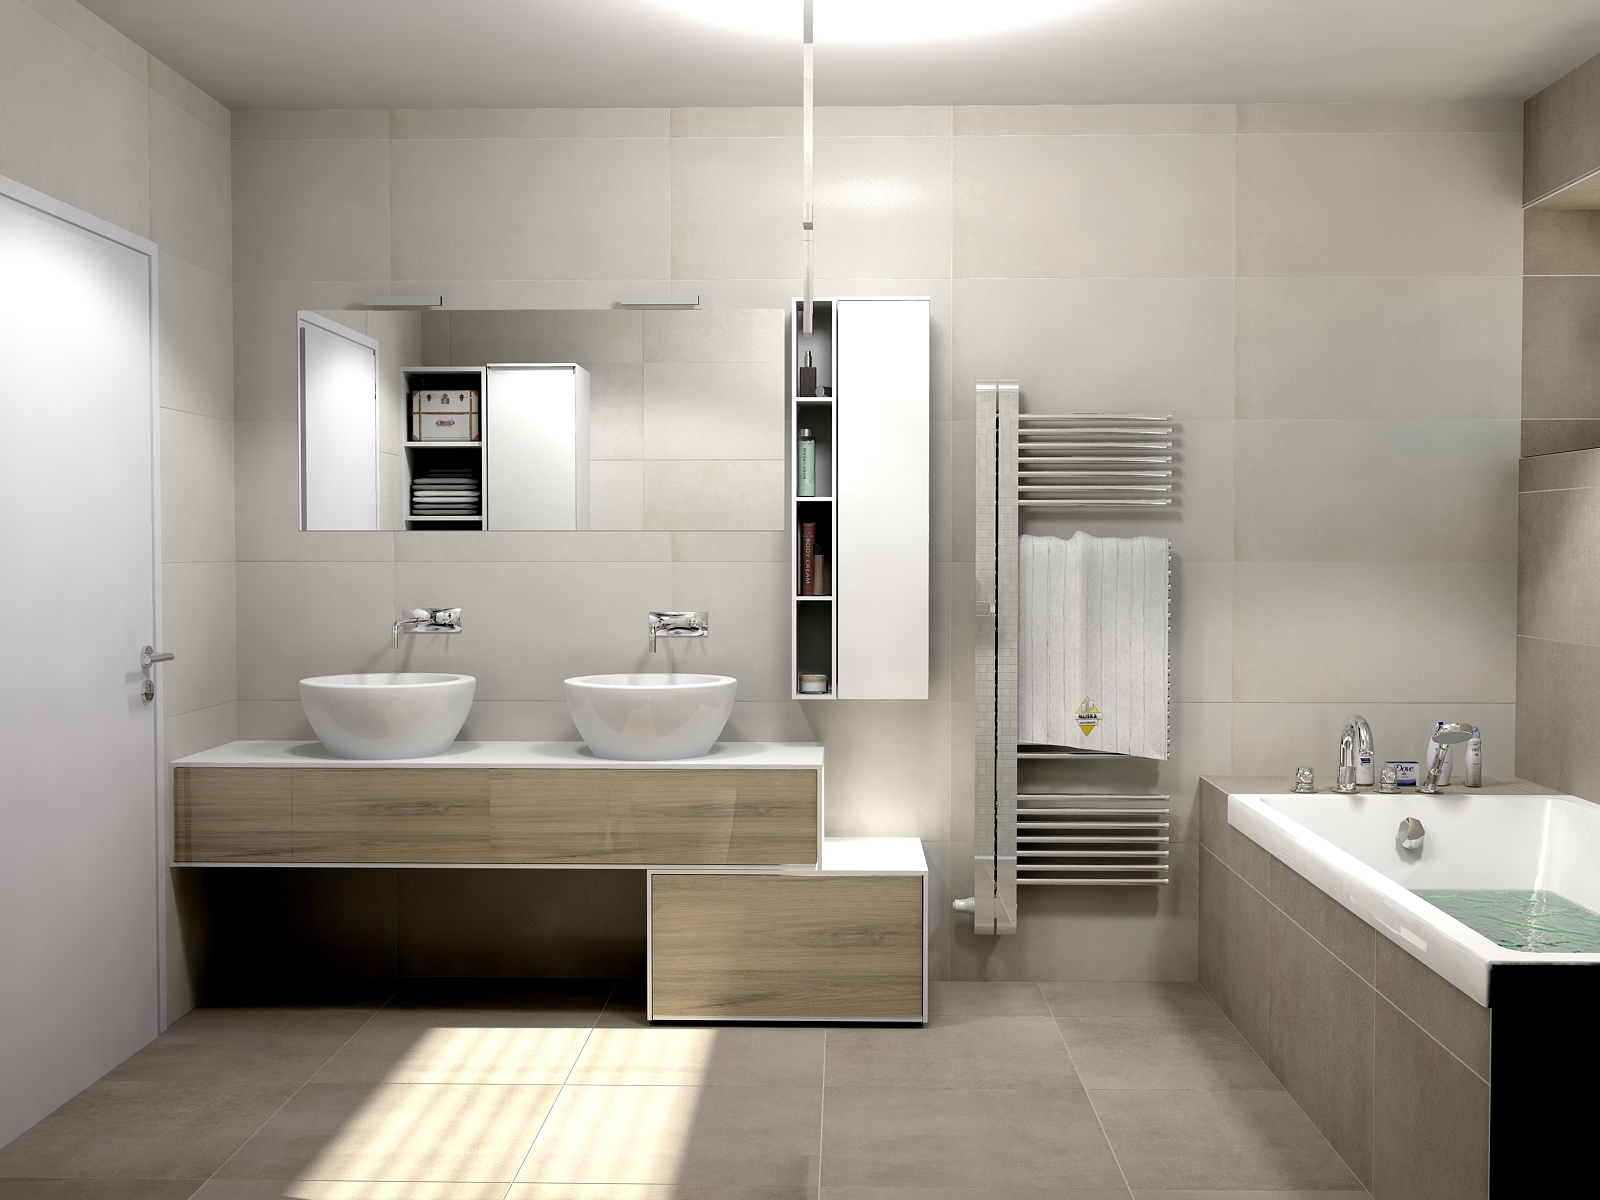 Floorgres industrial bathroom by mitja paliska doopaliska floorgres industrial dailygadgetfo Image collections